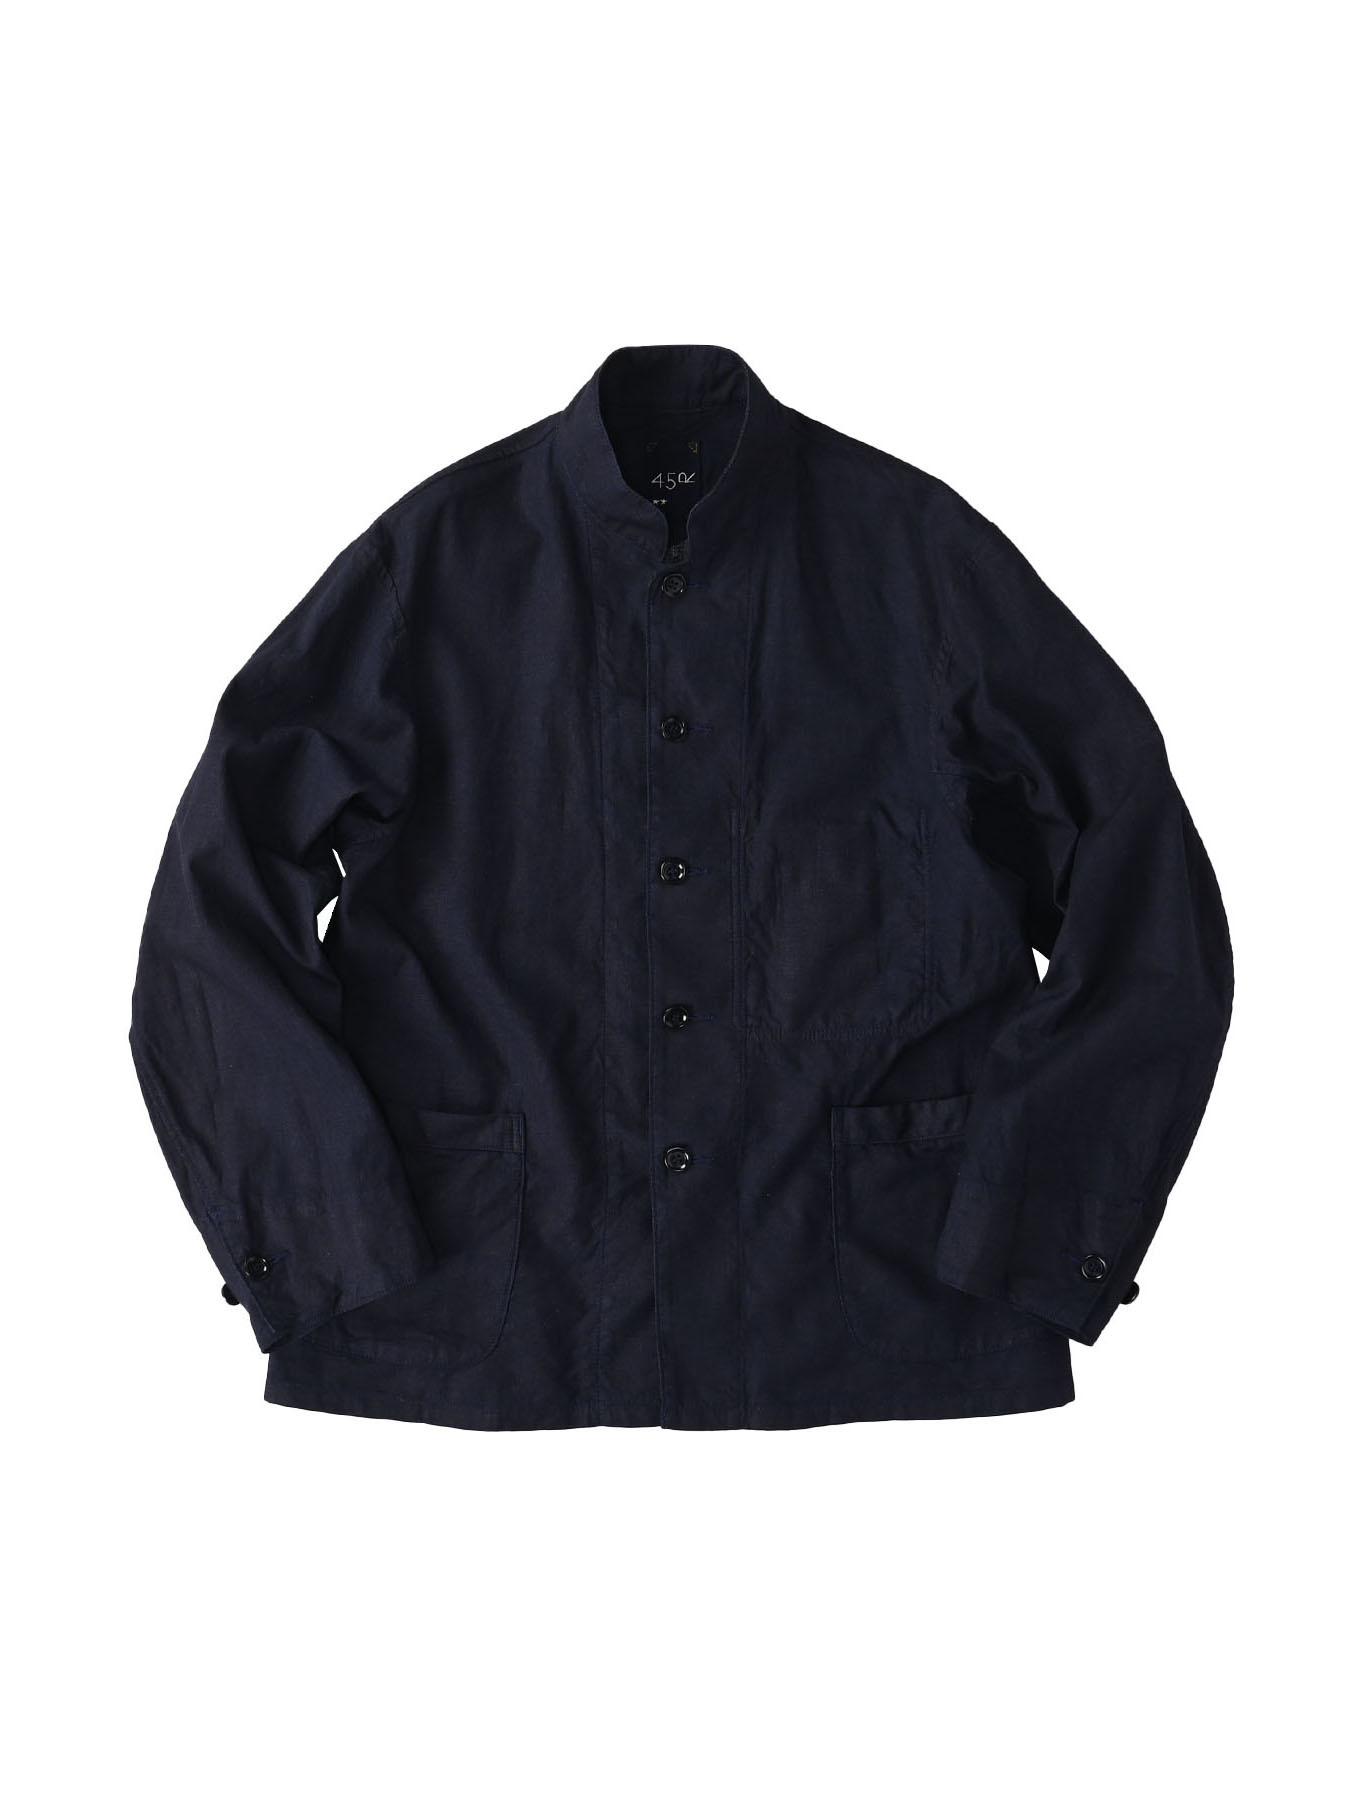 Indigo Double Woven 908 Shirt Jacket (0421)-1